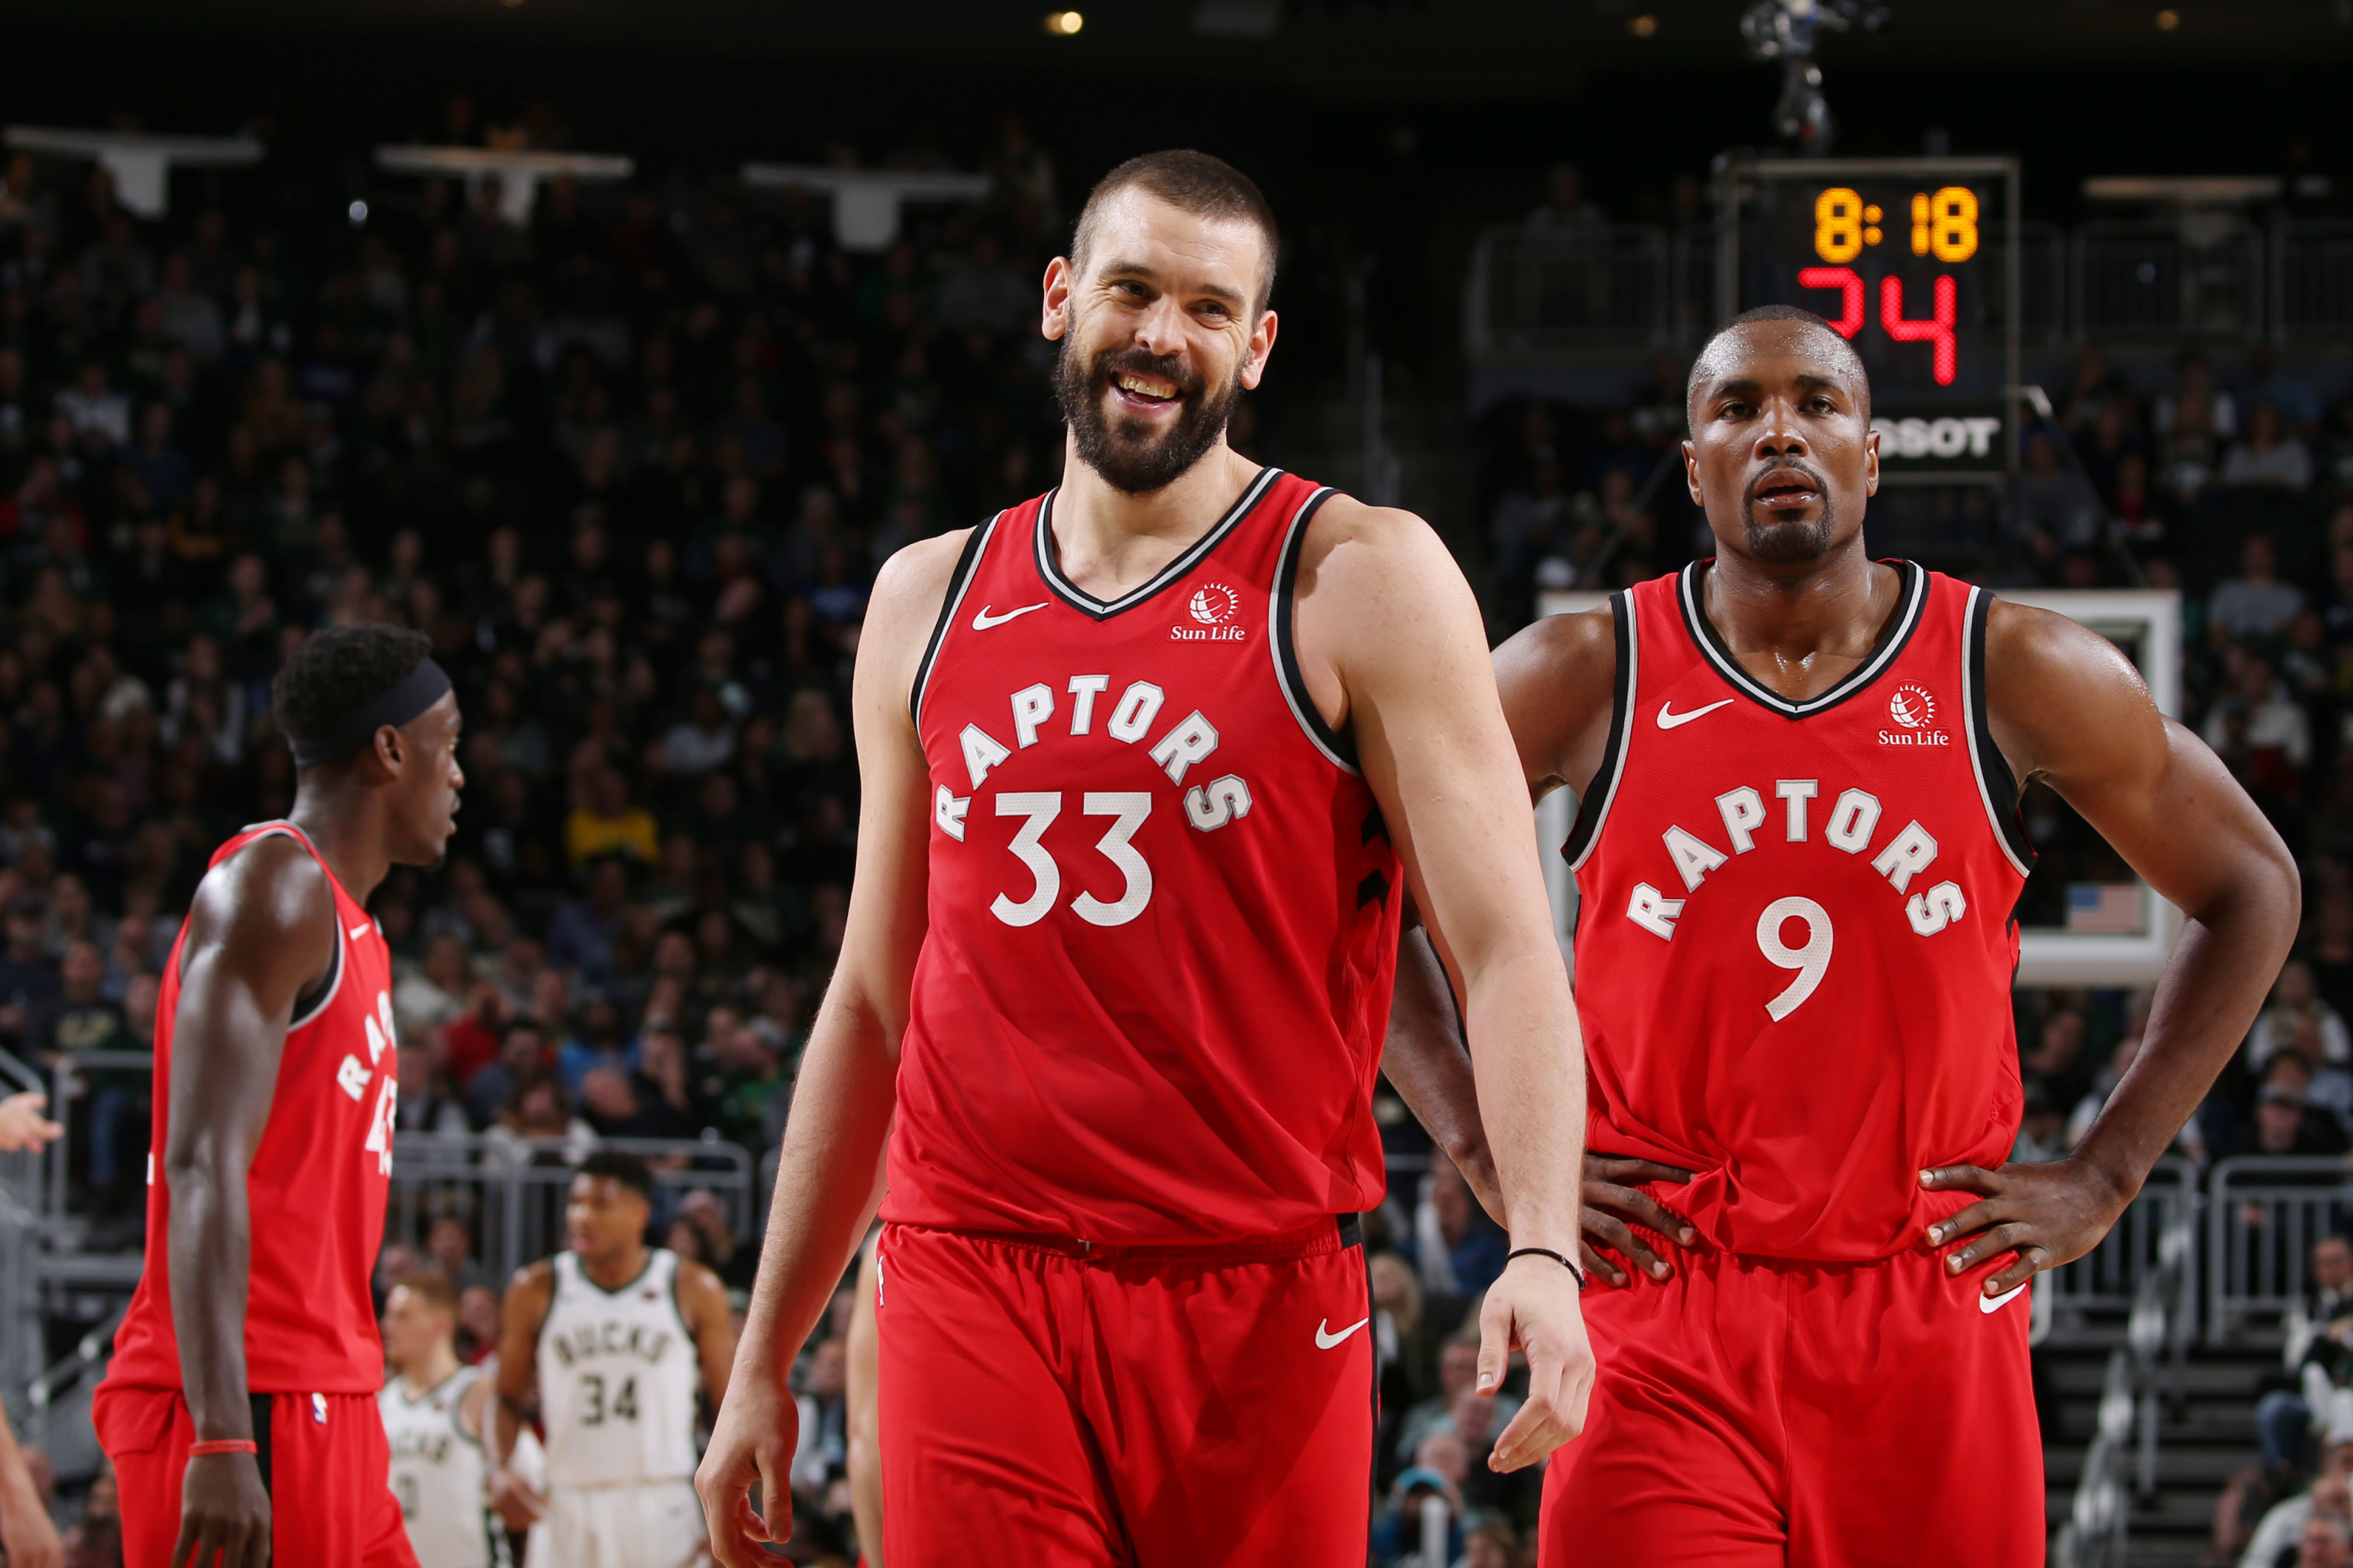 Should the Toronto Raptors trade Marc Gasol or Serge Ibaka?